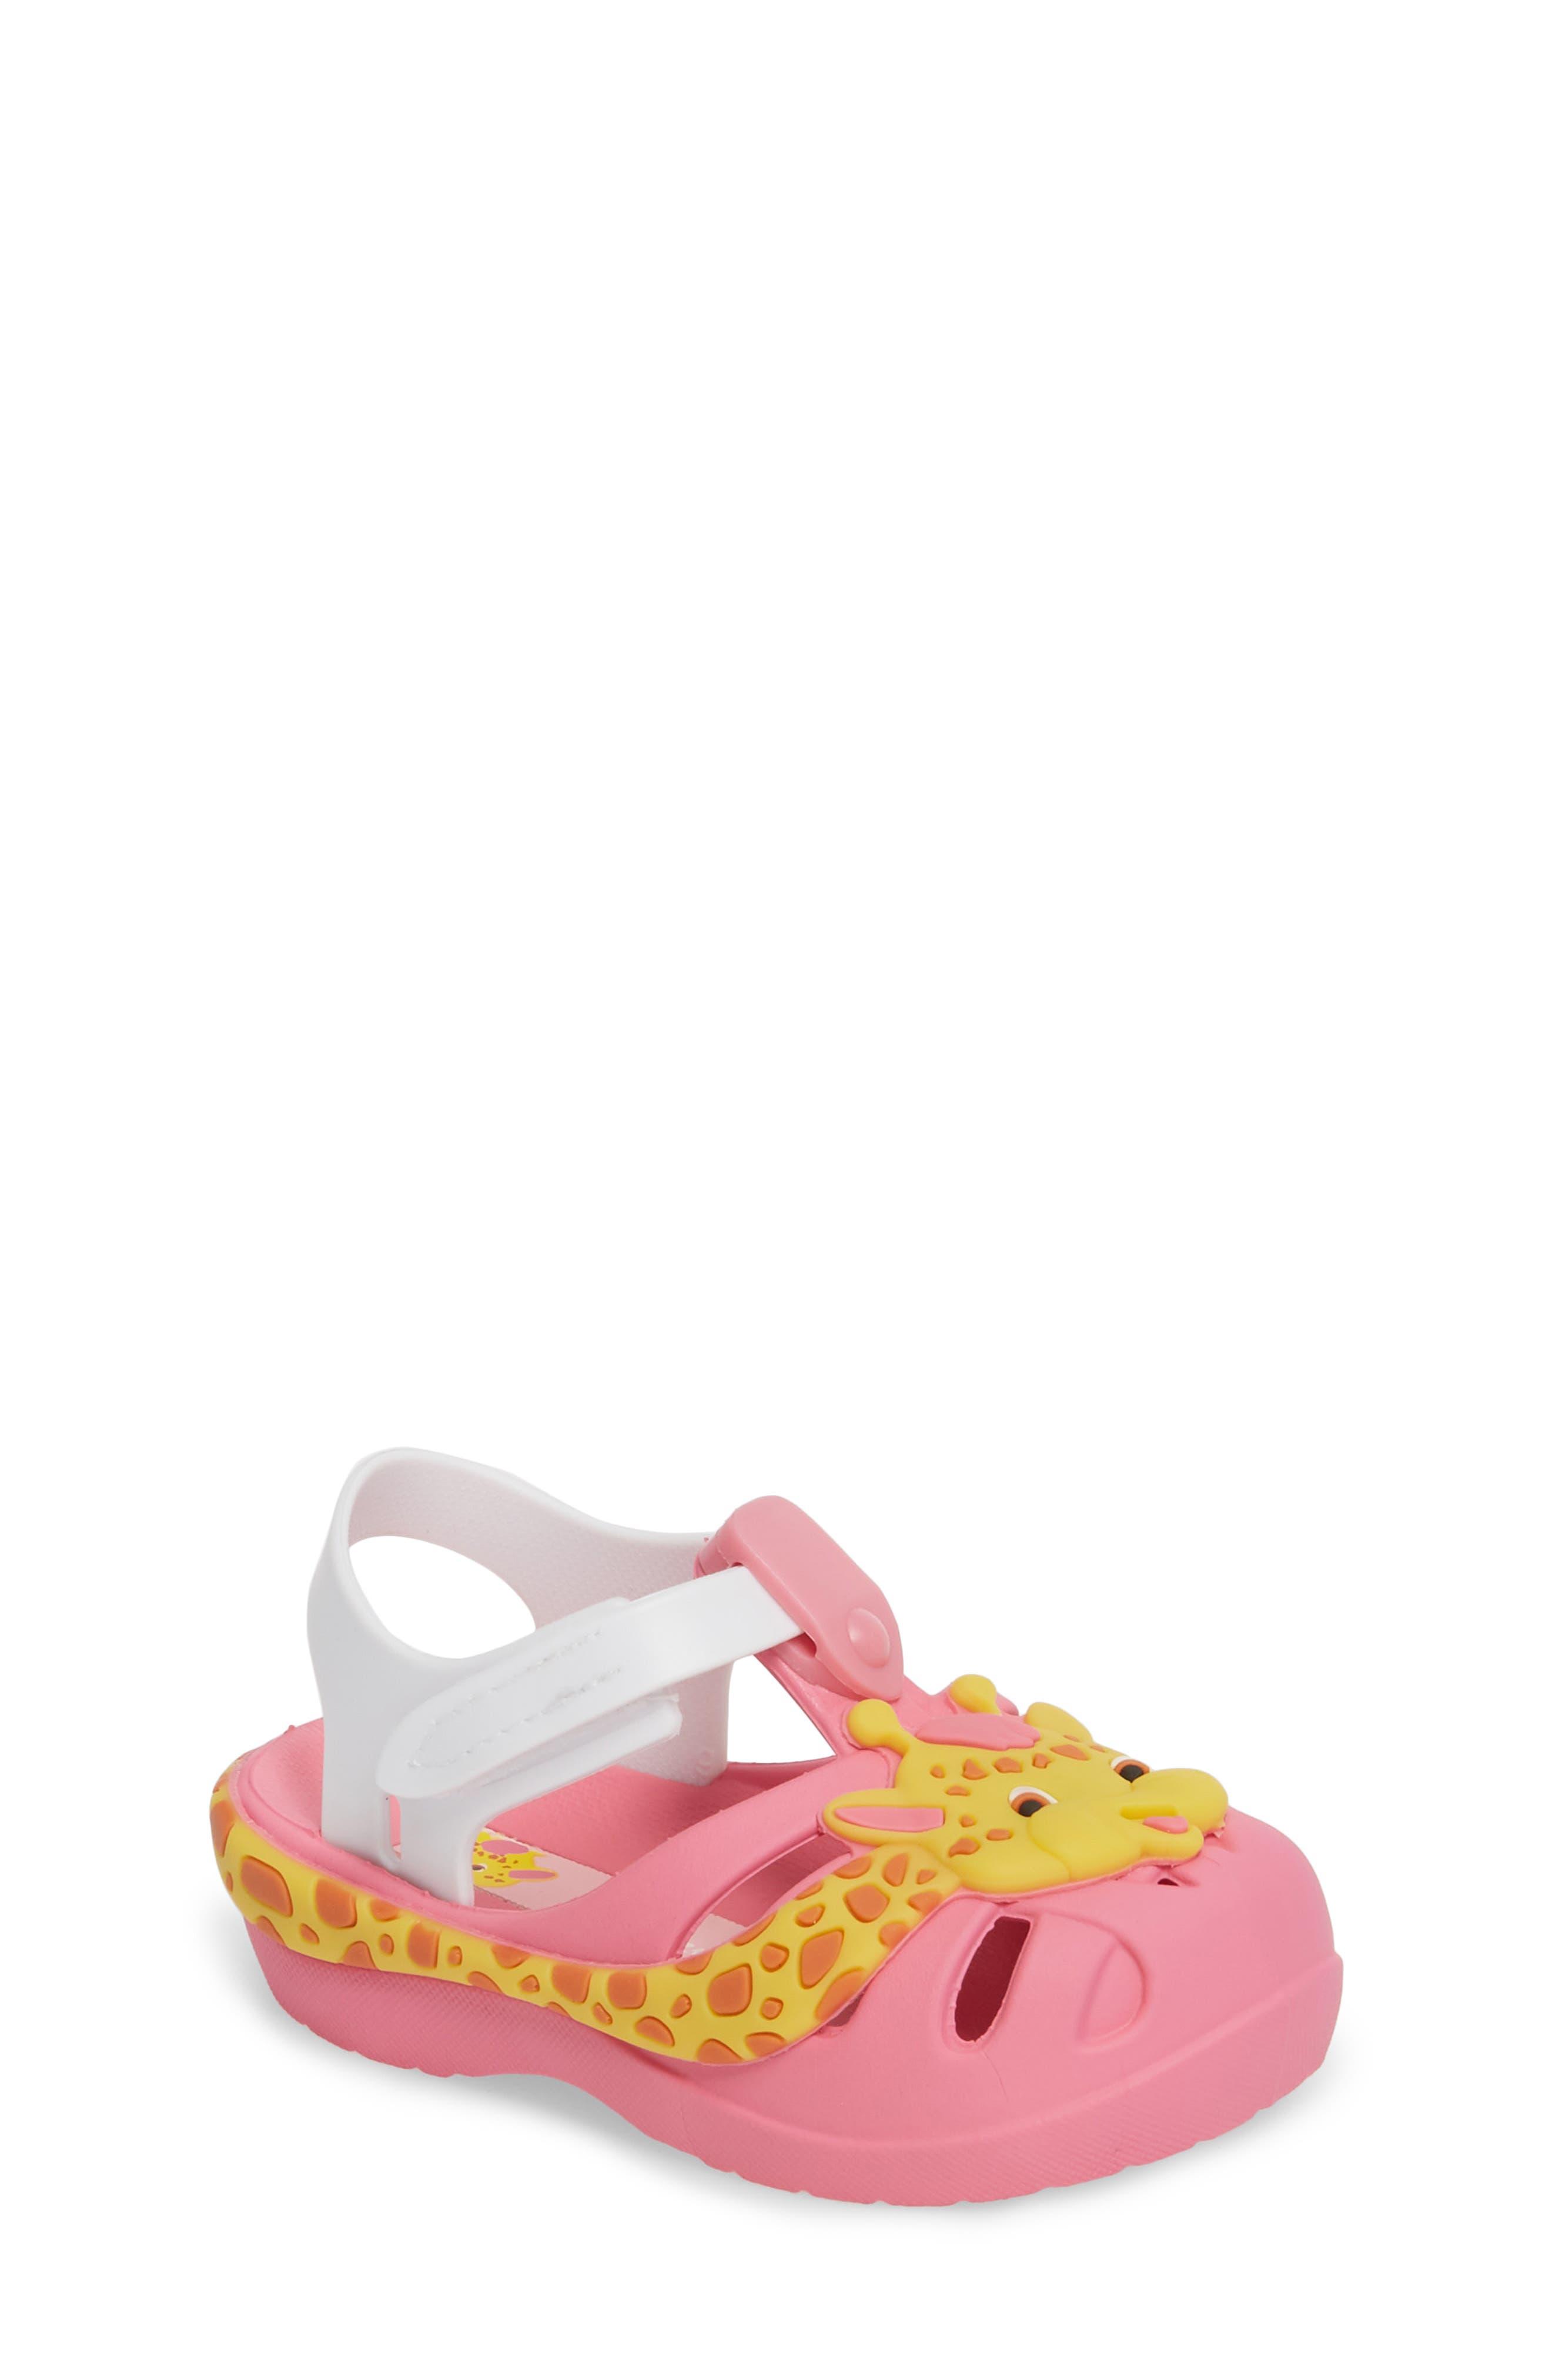 Summer Baby Waterproof Sandal,                         Main,                         color, Pink/ White